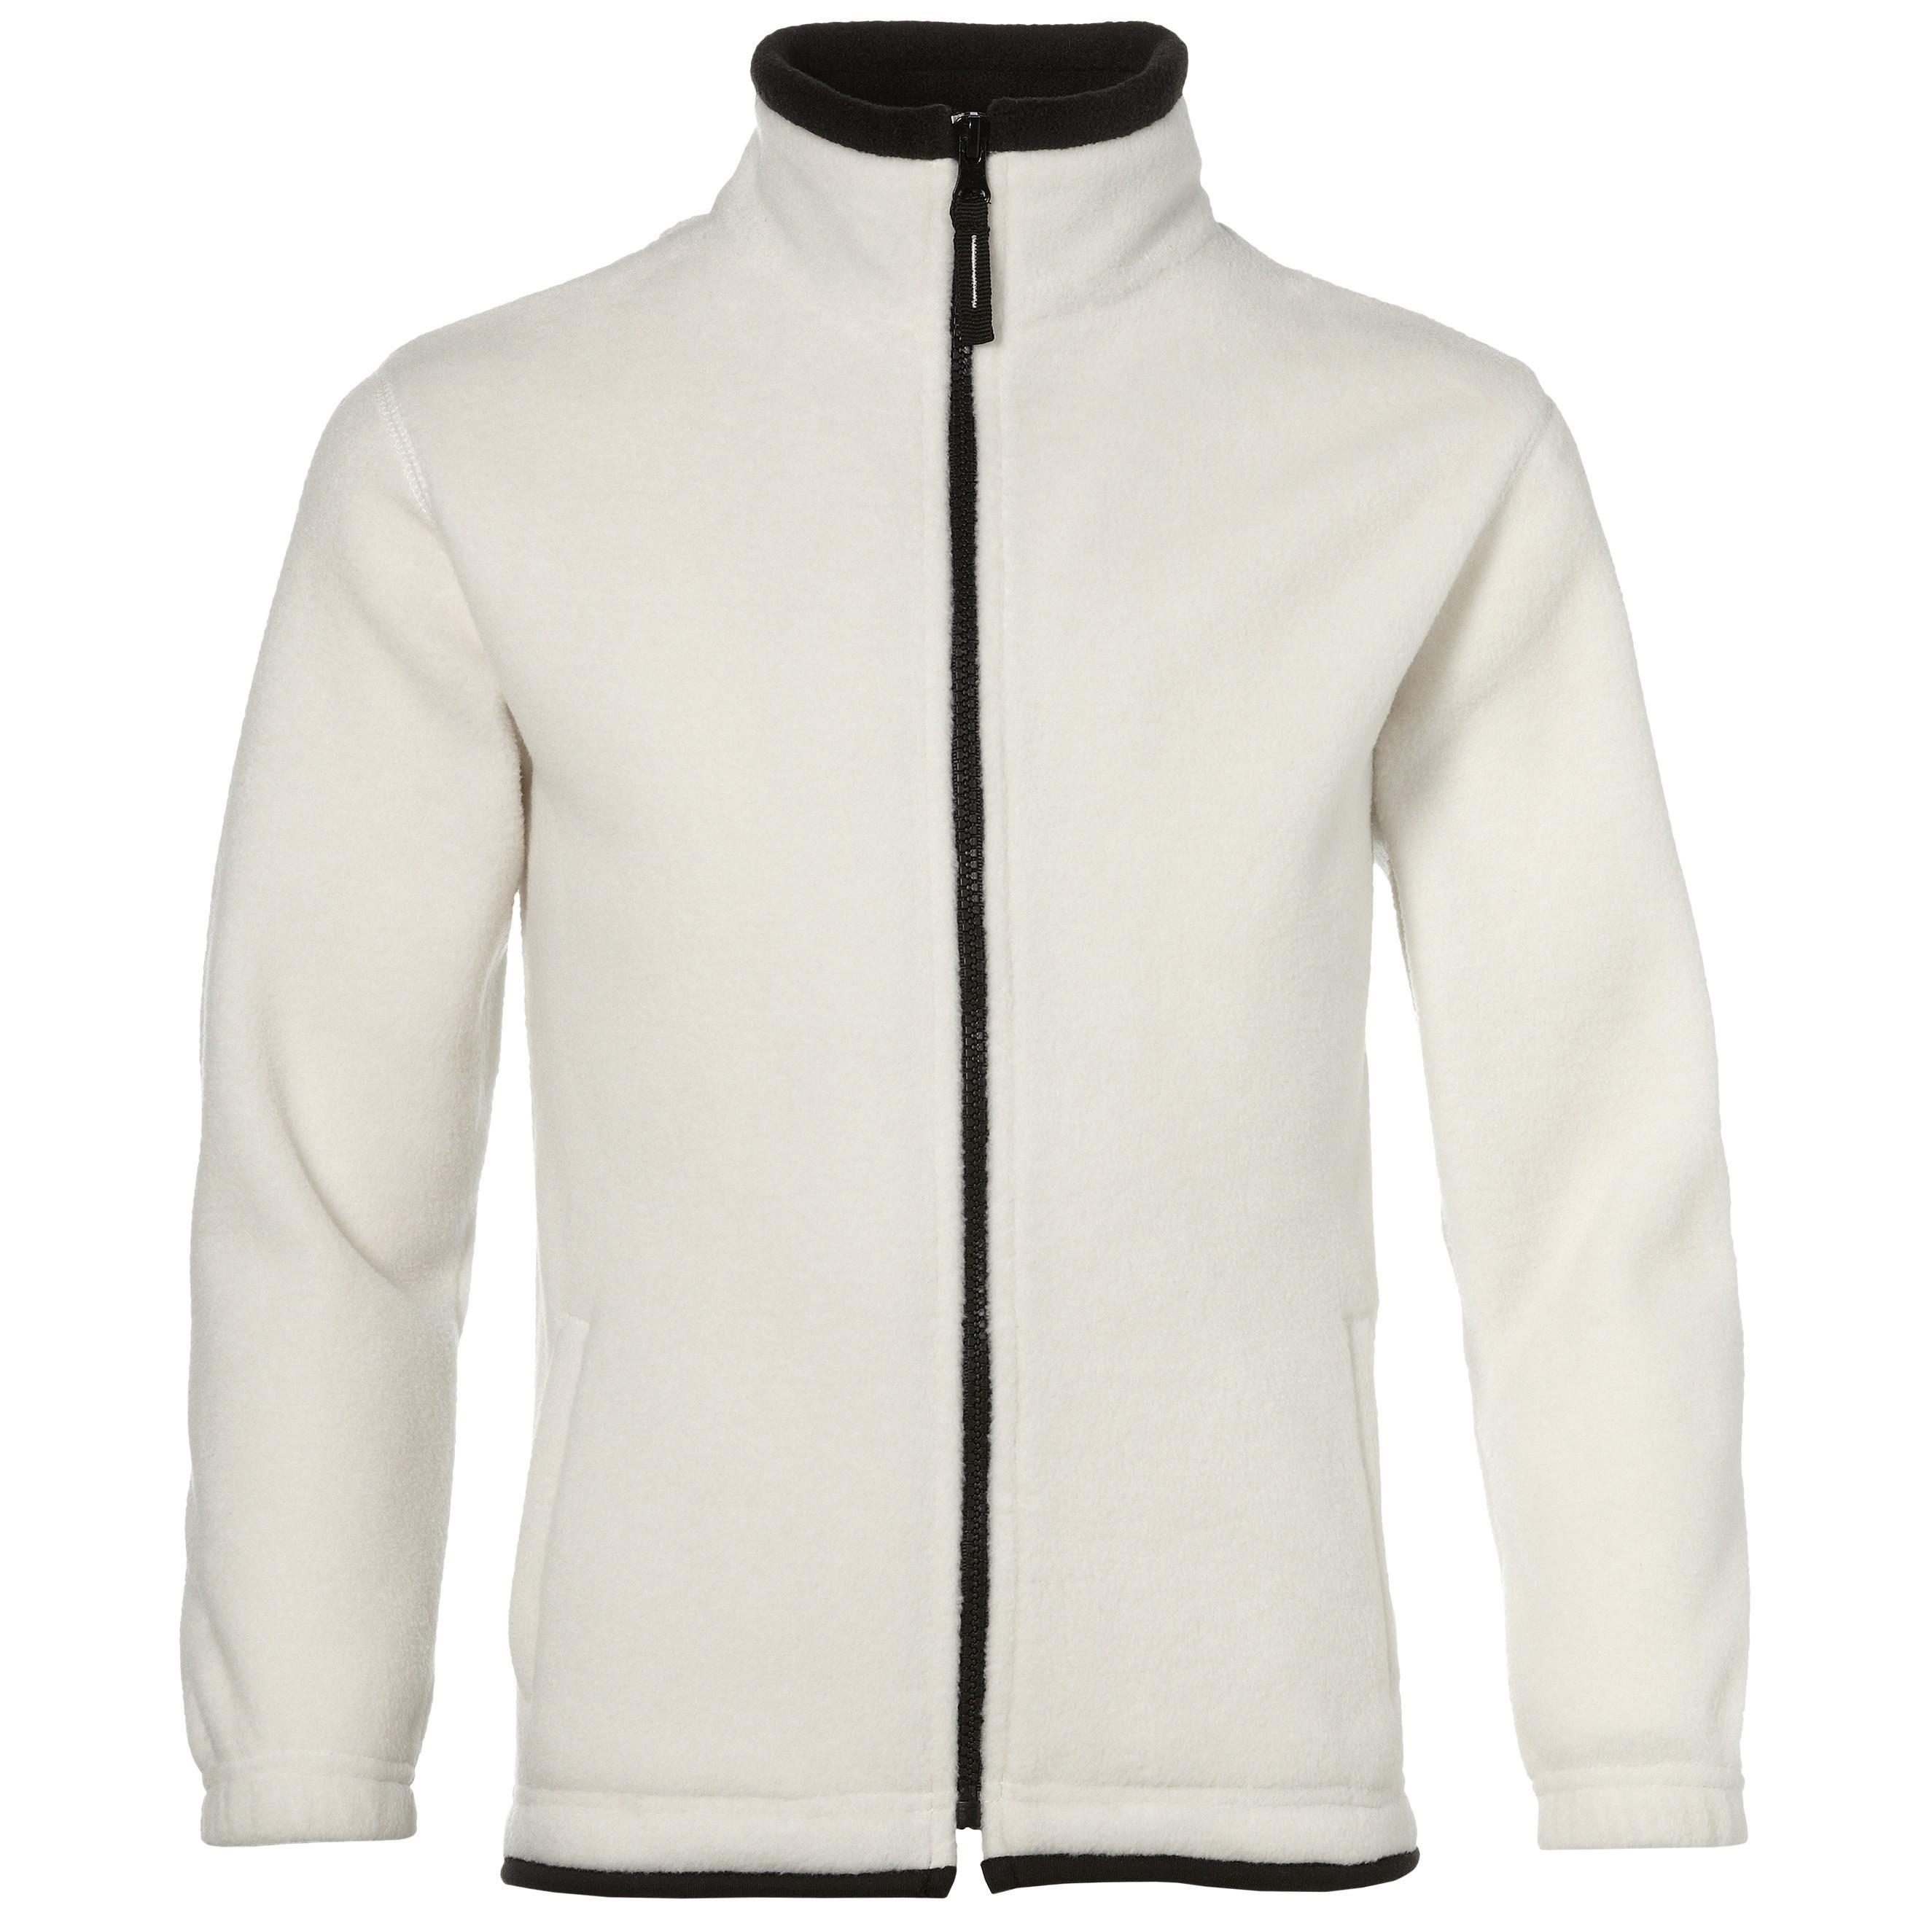 Us Basic Houston Kids Fleece Jacket - White Only